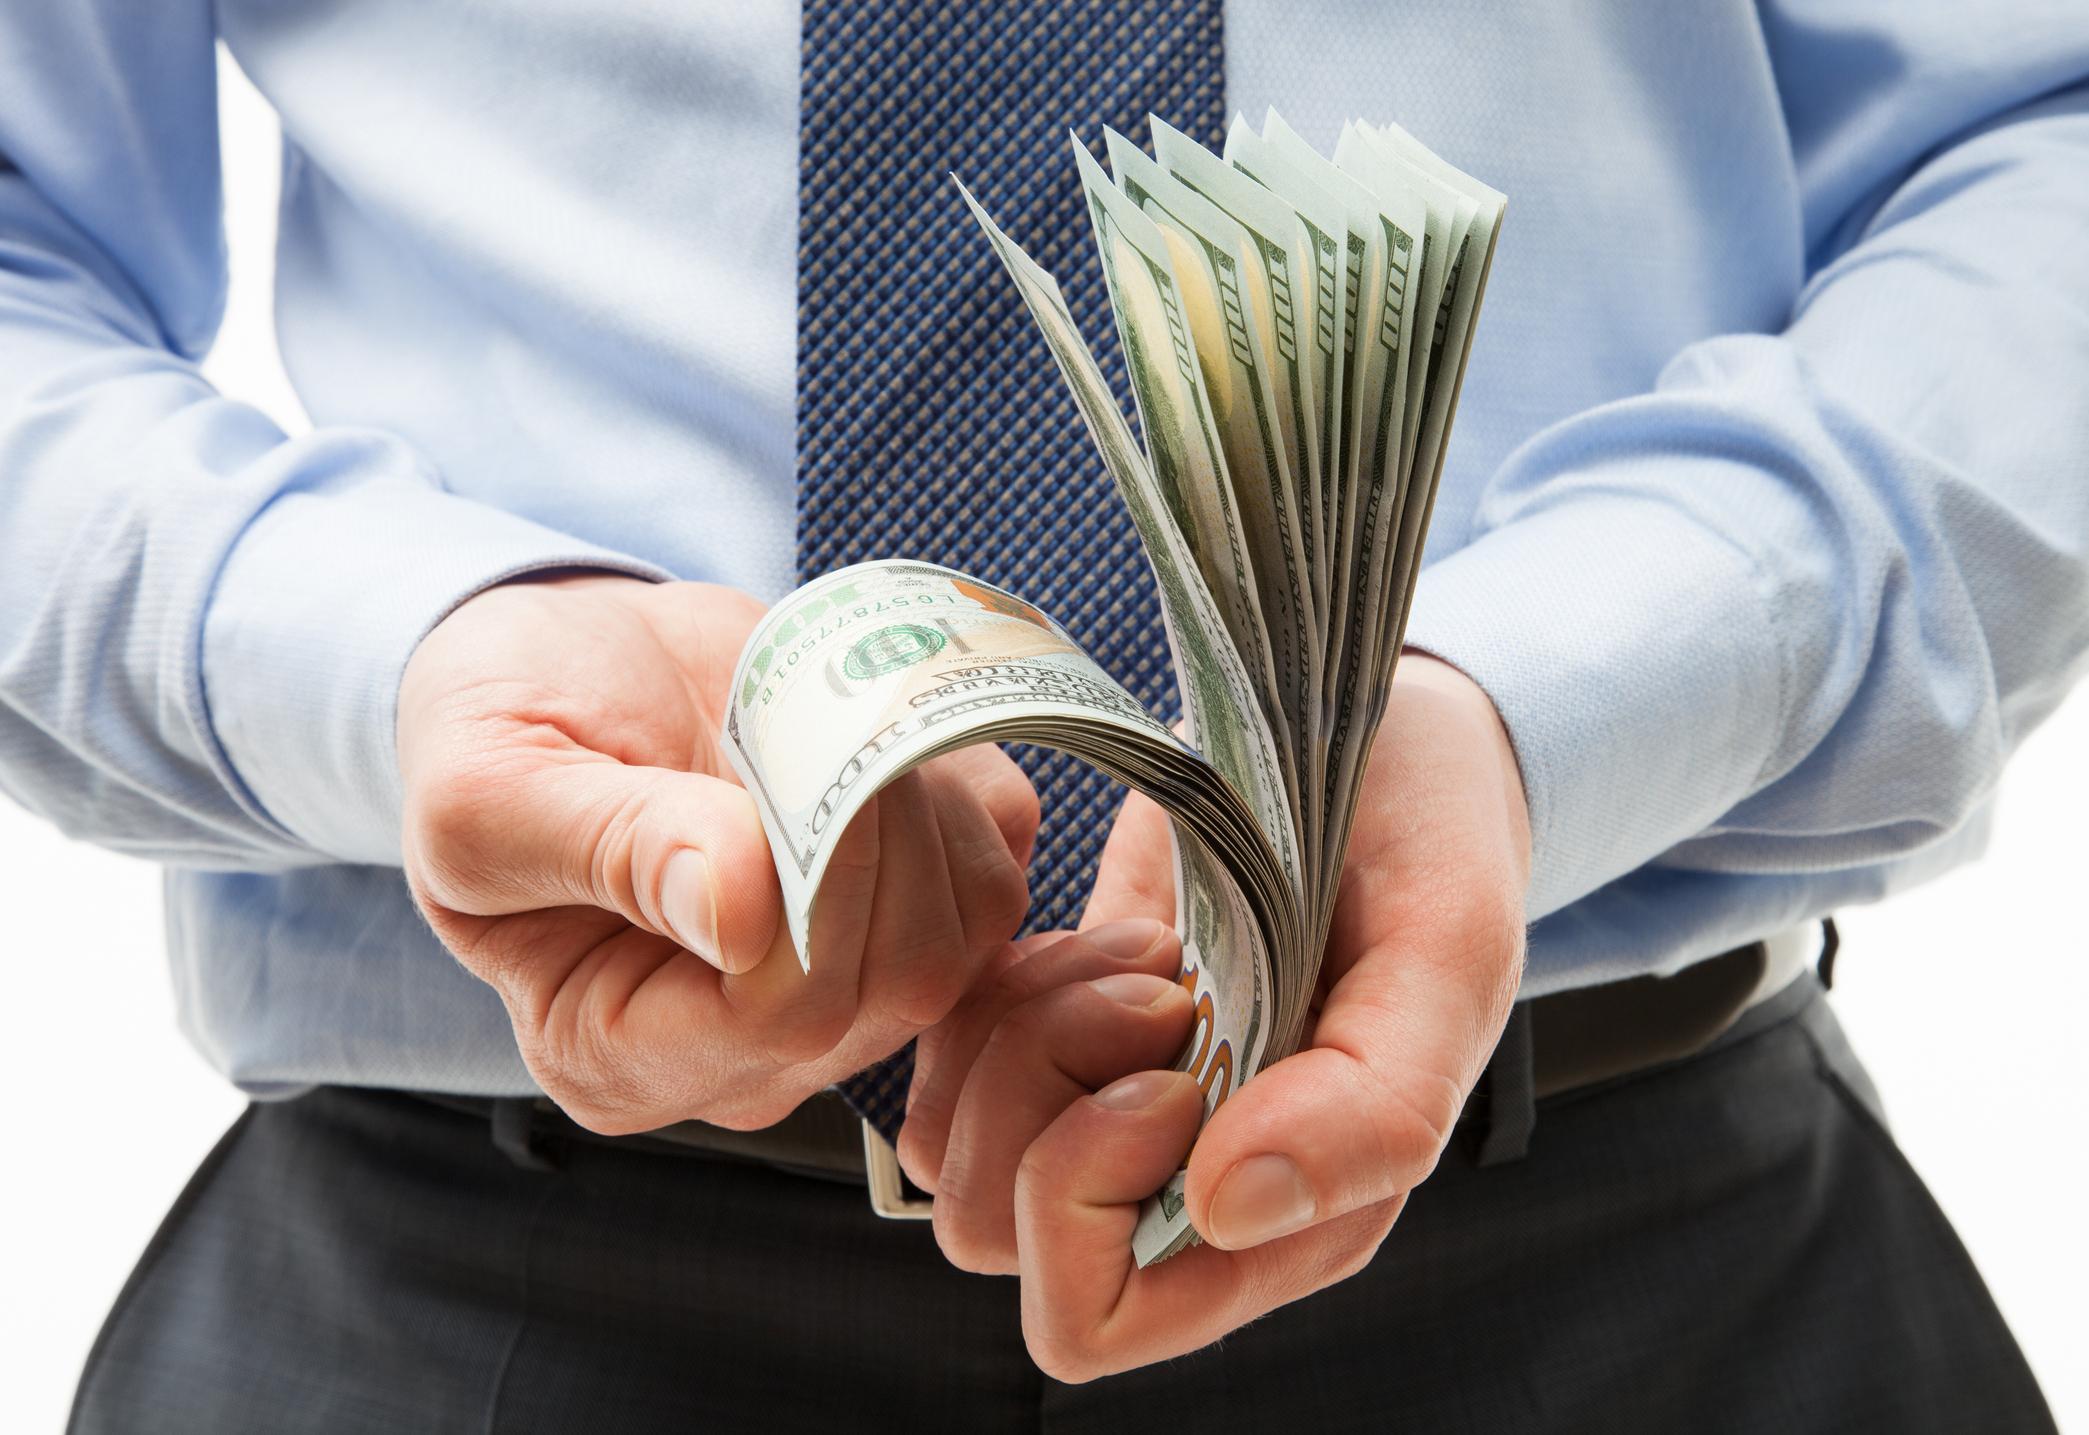 Man flipping through stack of hundred-dollar bills